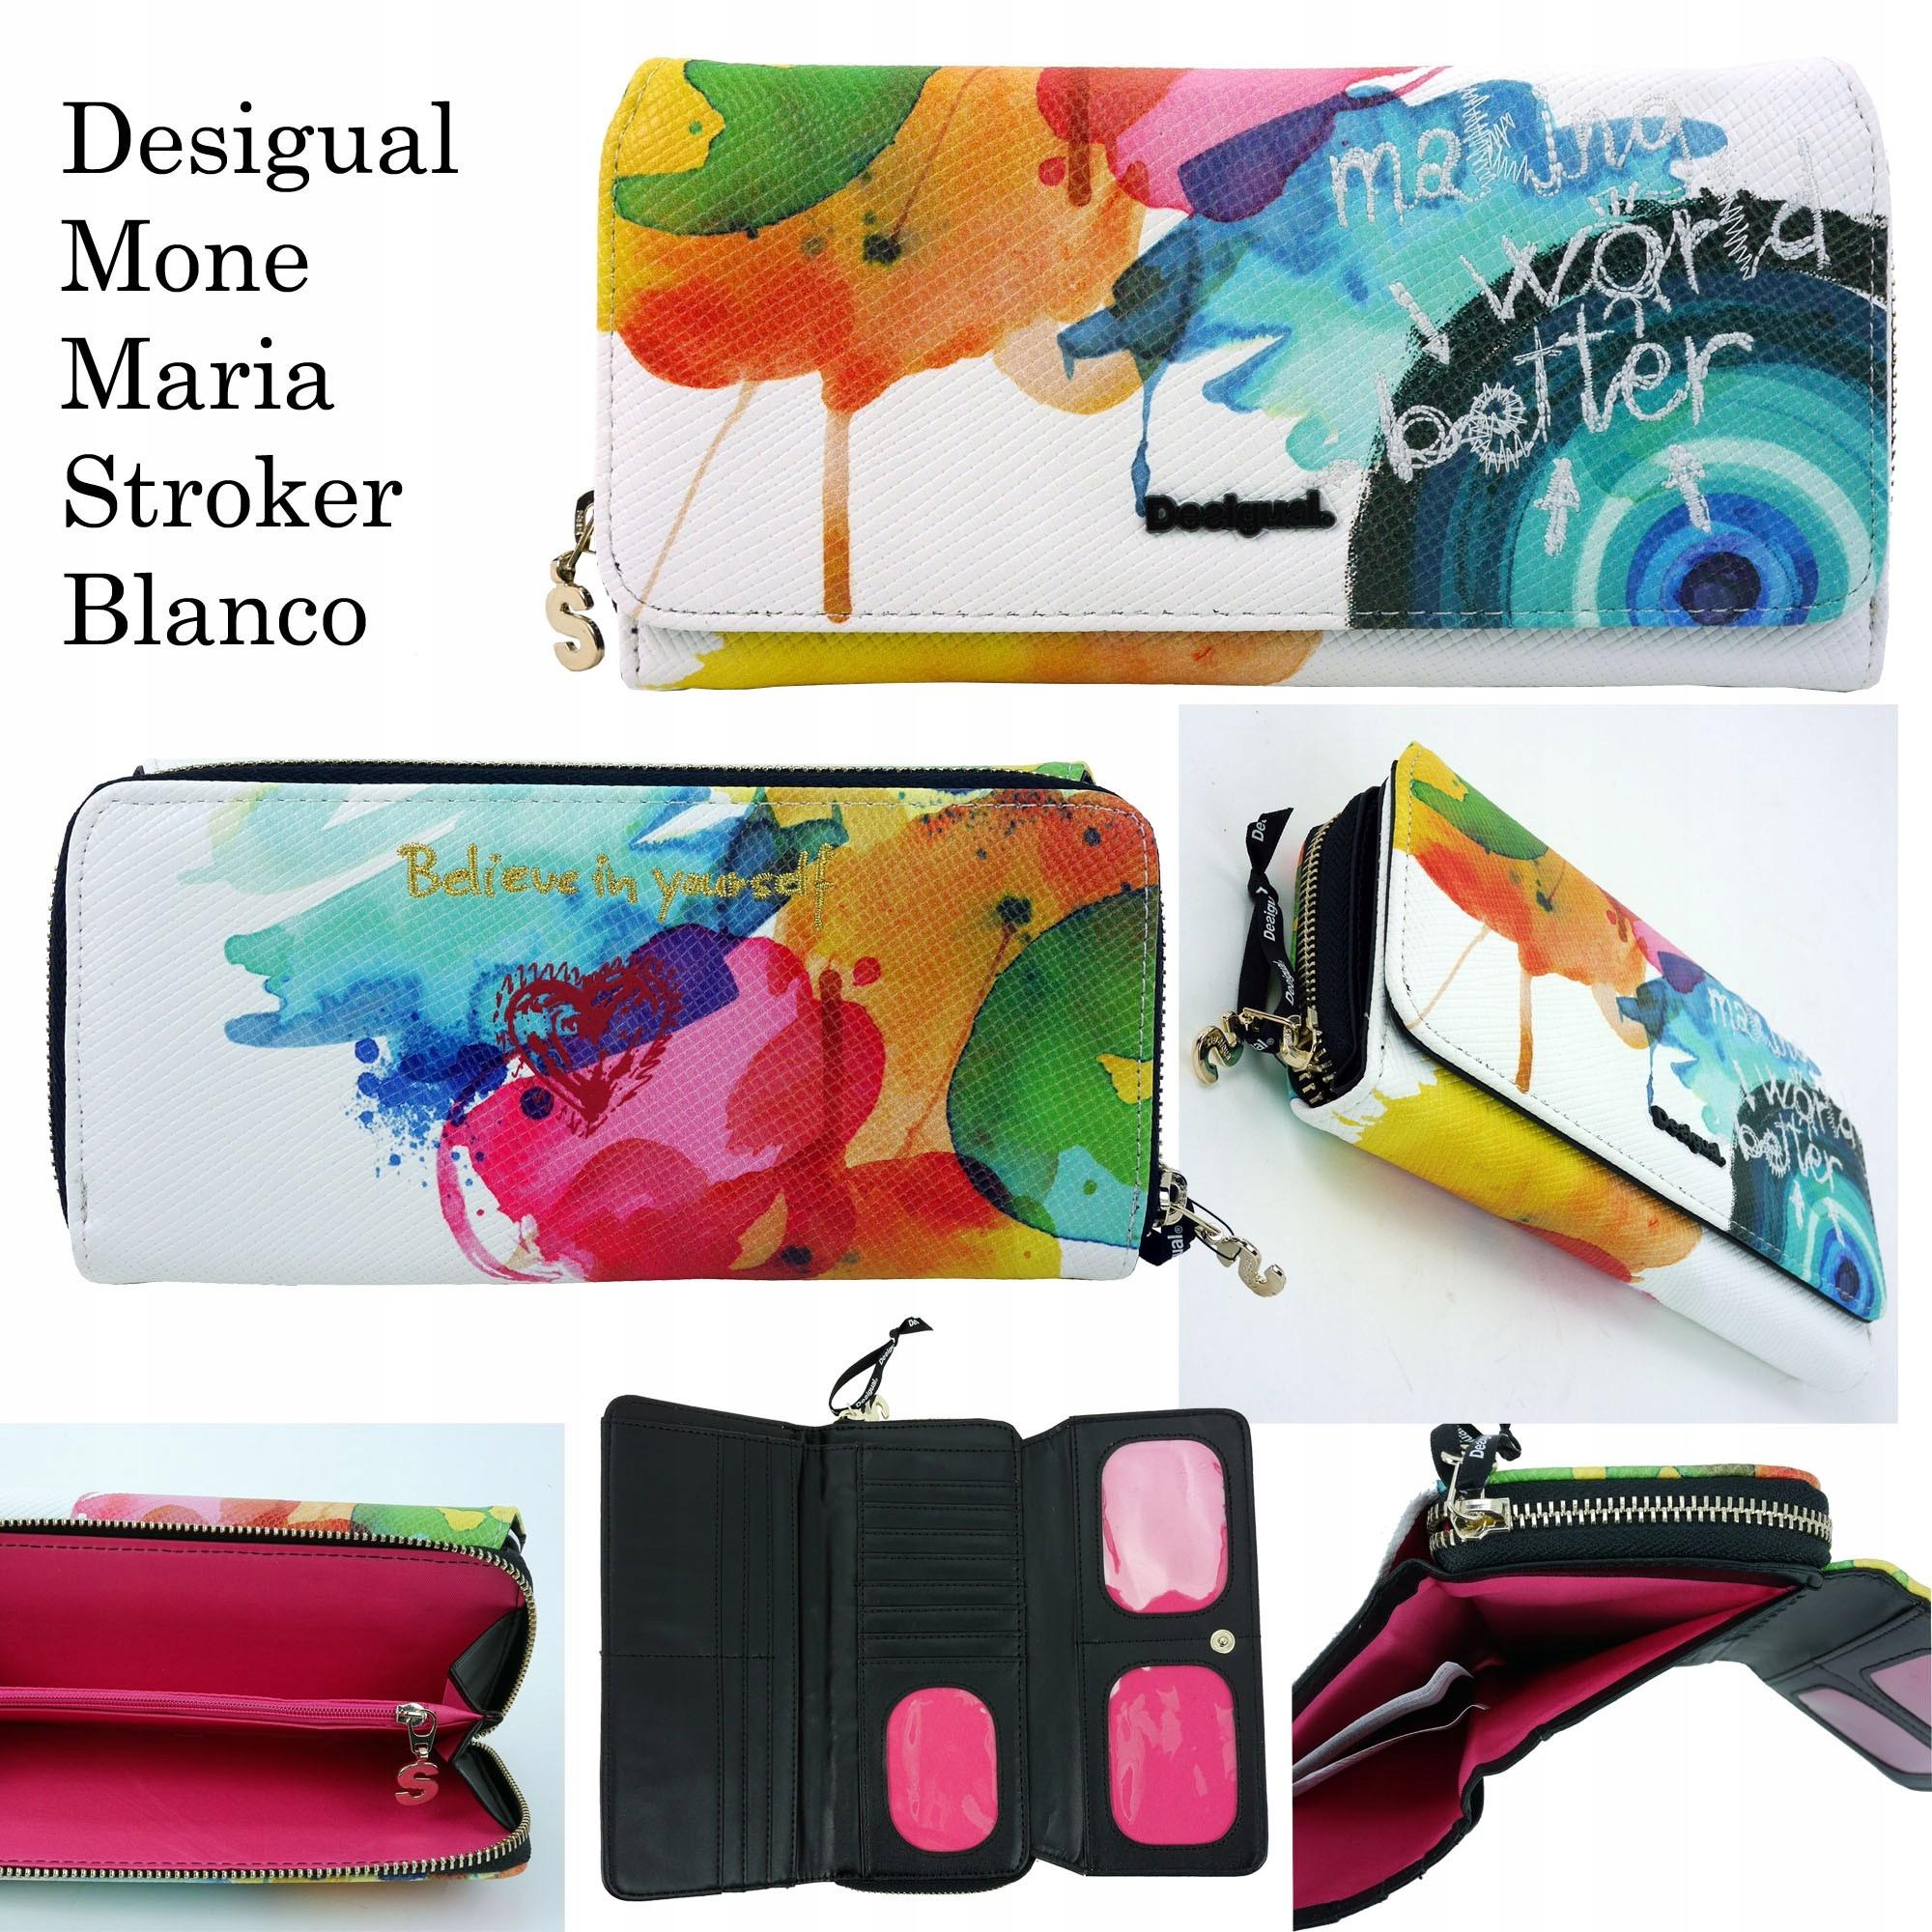 838ef7df534 DESIGUAL portfel BIG MONE MARIA STOKER - 7482185098 - oficjalne ...